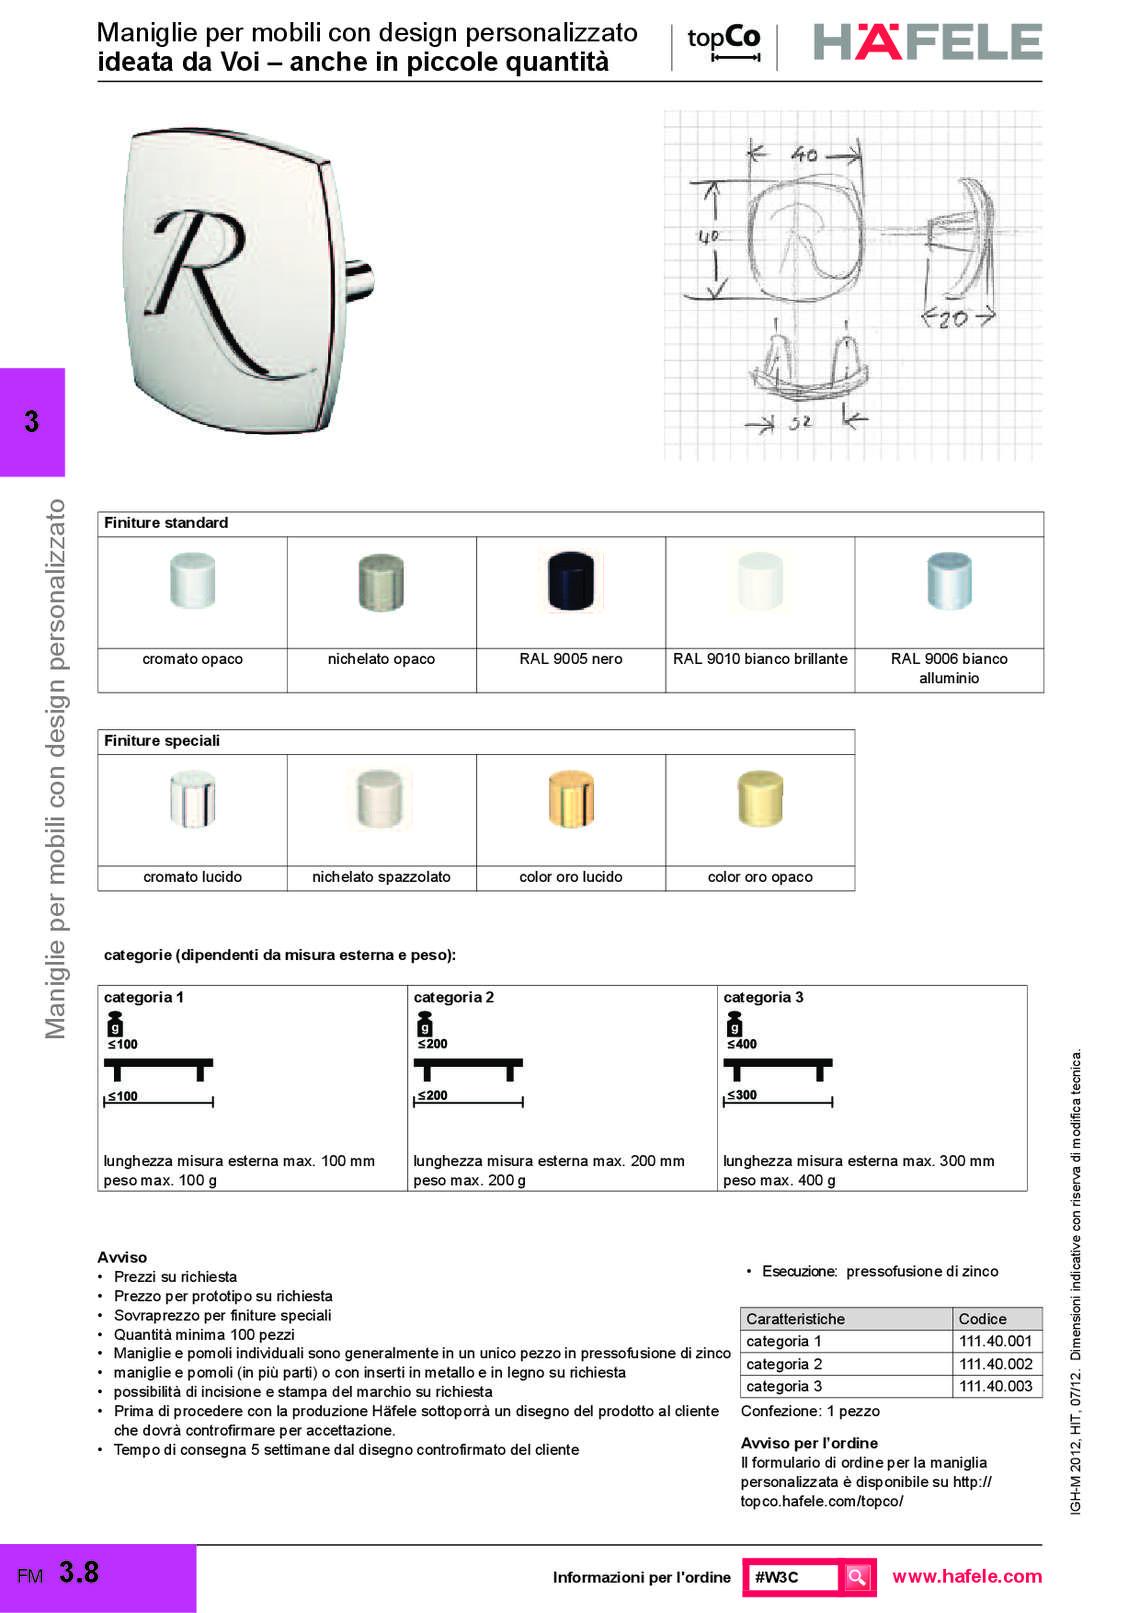 hafele-prodotti-su-misura_81_017.jpg